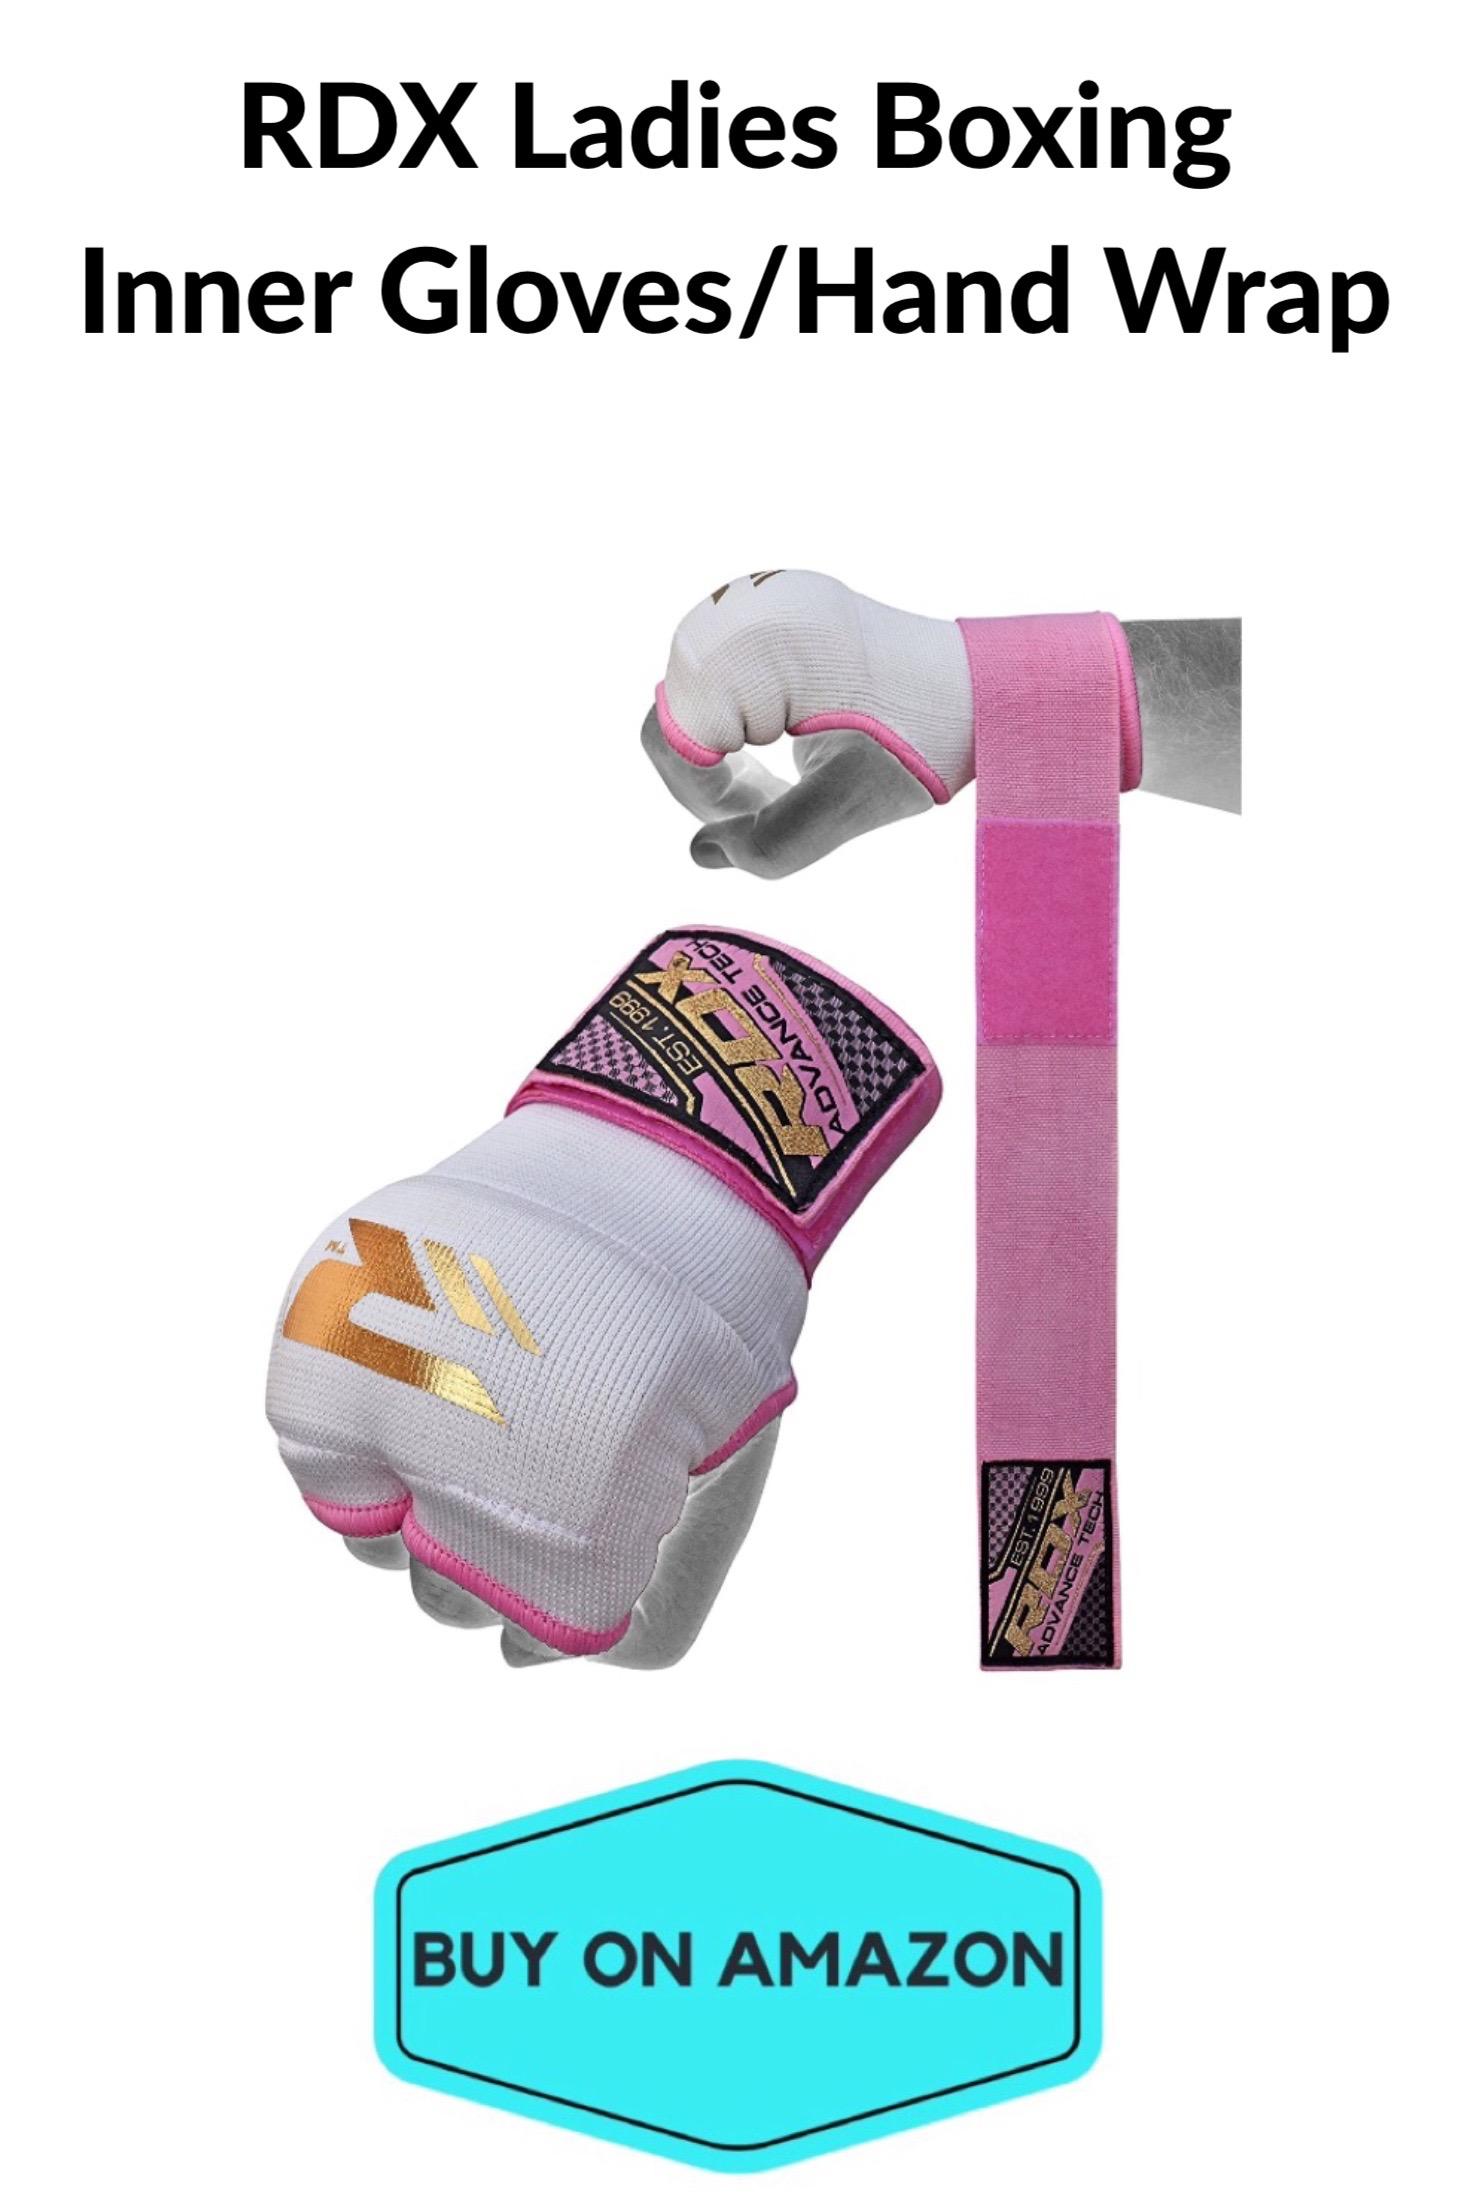 RDX Ladies Boxing Inner Gloves/Hand Wrap